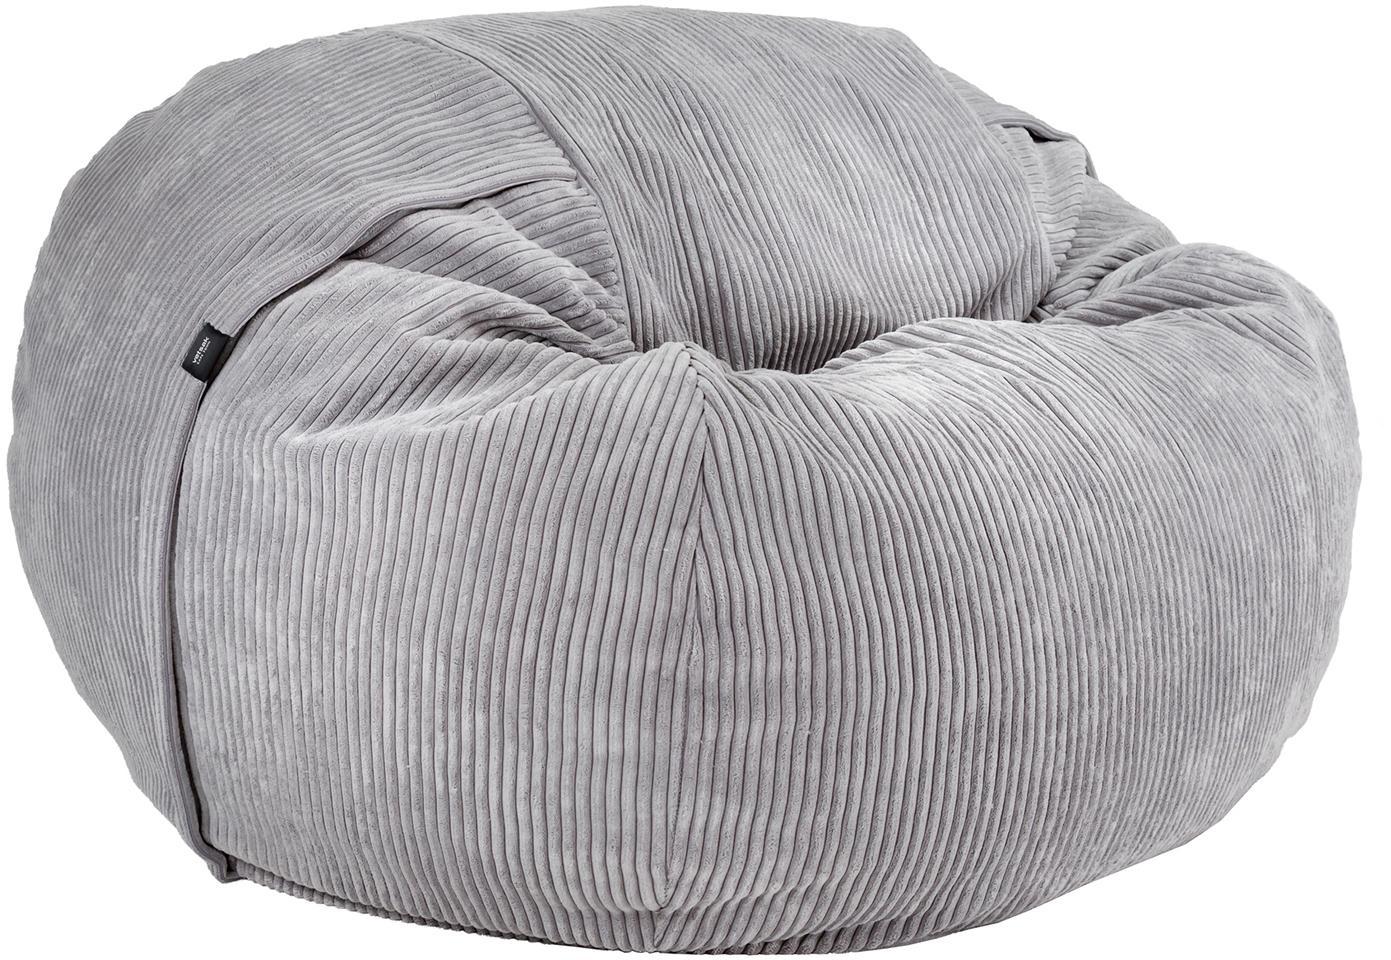 Cord-Sitzsack Velours, Bezug: 88% Nylon, 12% Polyester , Hellgrau, Ø 110 x H 70 cm